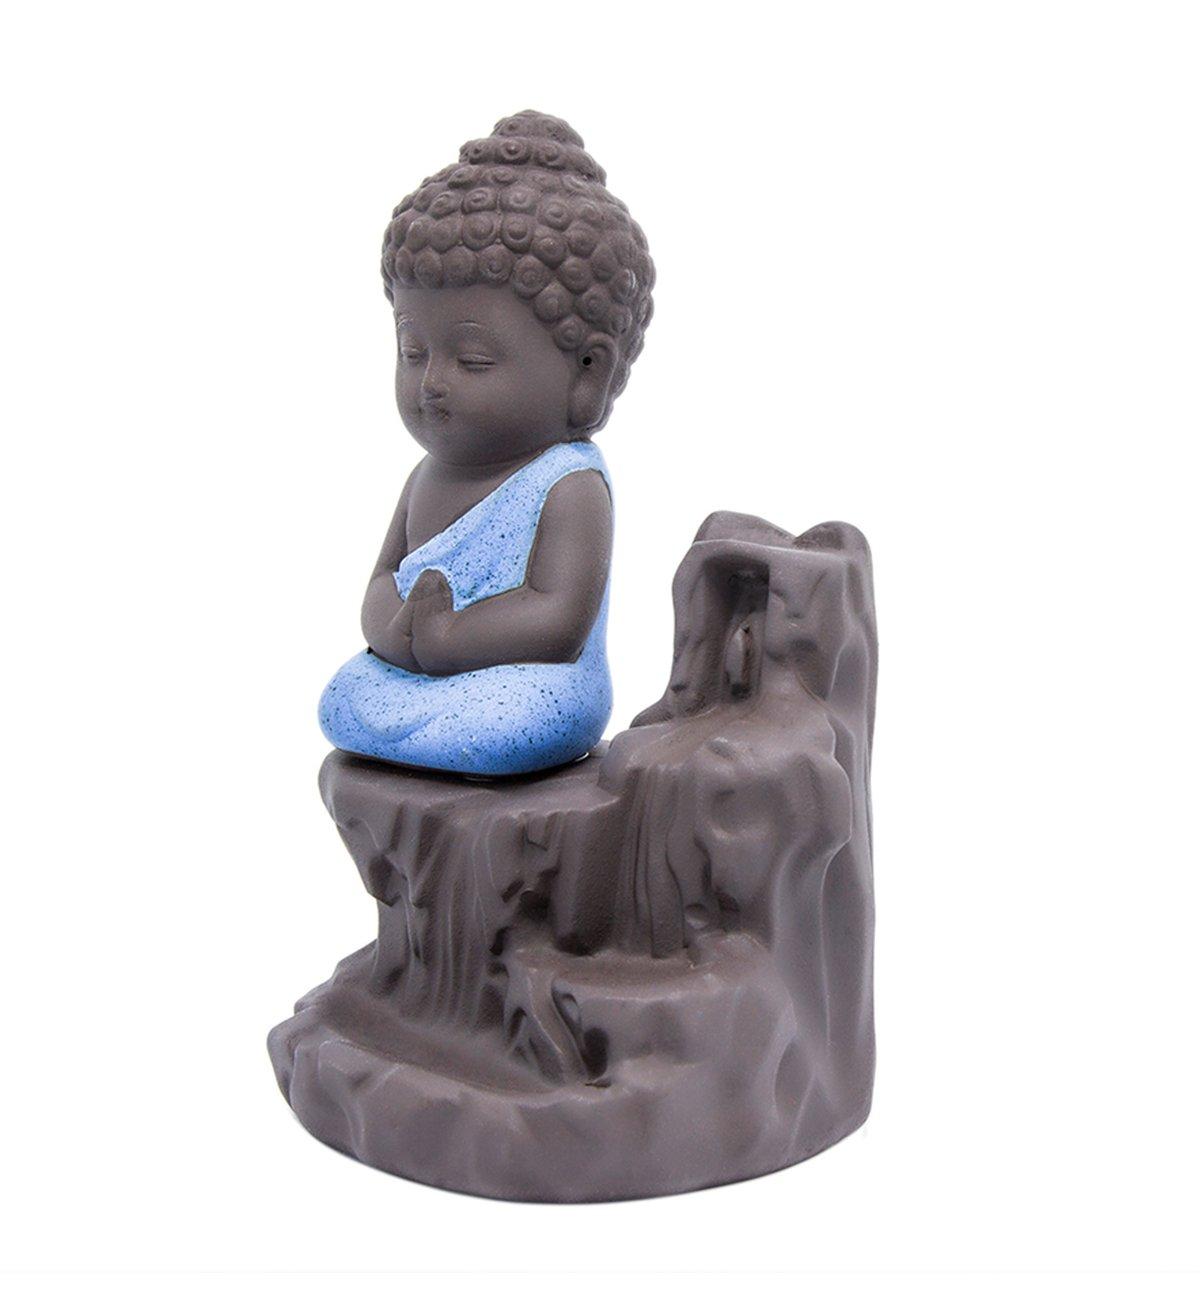 Incense Burner Backflow Tower Cones Sticks Holder Ceramic Porcelain Buddha Monk Ash Catcher Green OCIOLI IB-CS-M-Gn